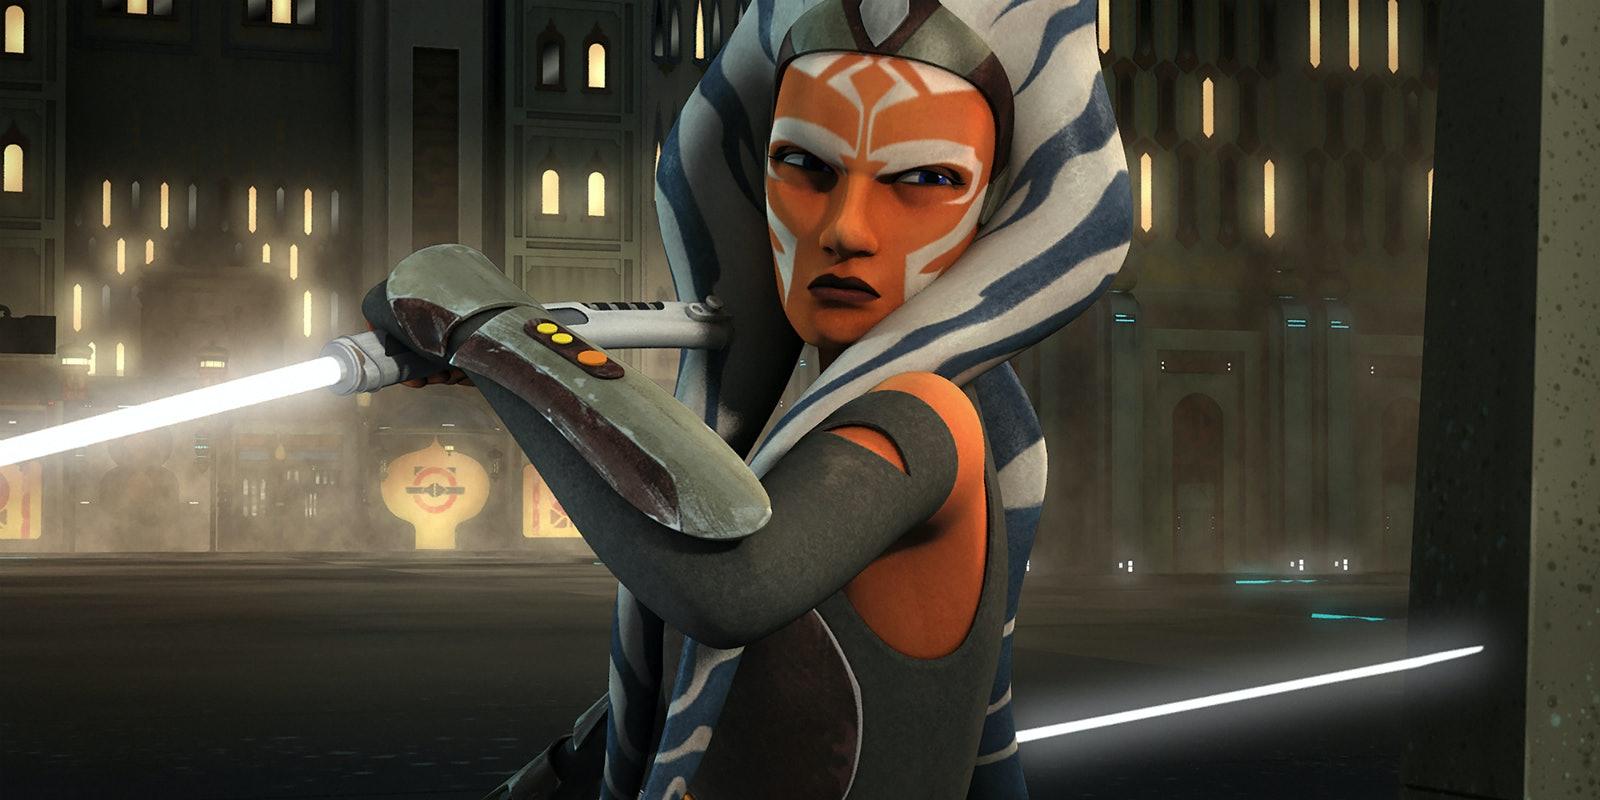 star wars rebels season 2 episode 18 download